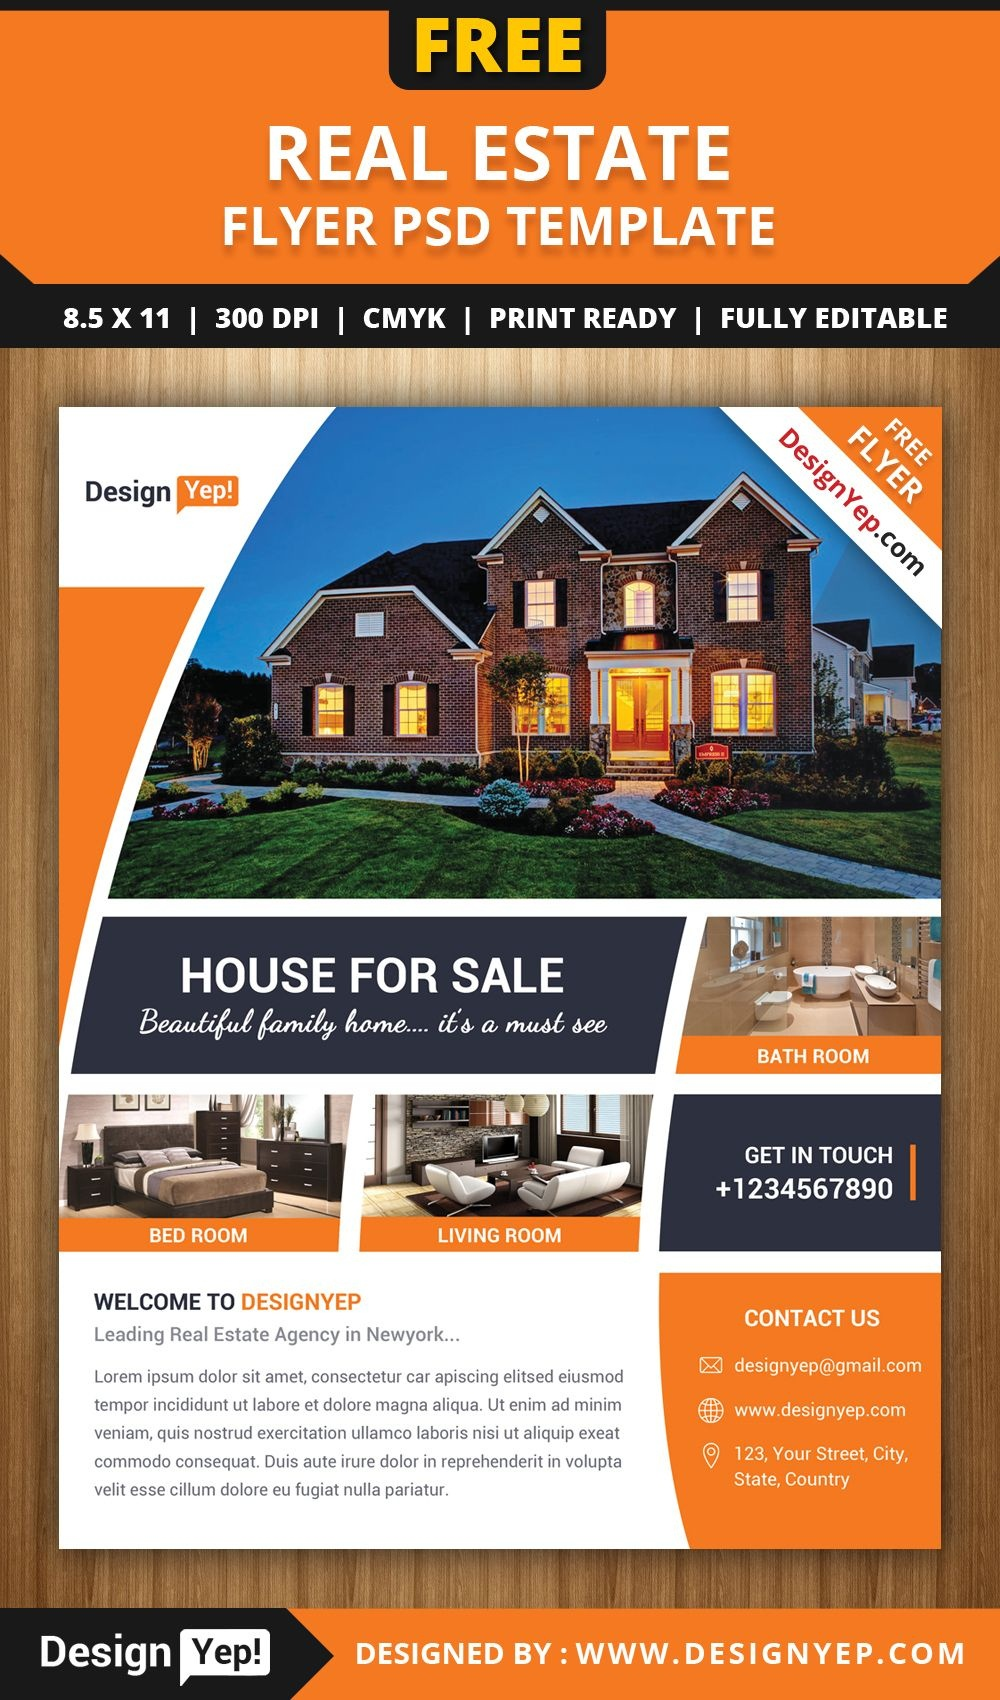 Pinsara On Design | Real Estate Flyer Template, Real Estate - Free Printable Real Estate Flyer Templates